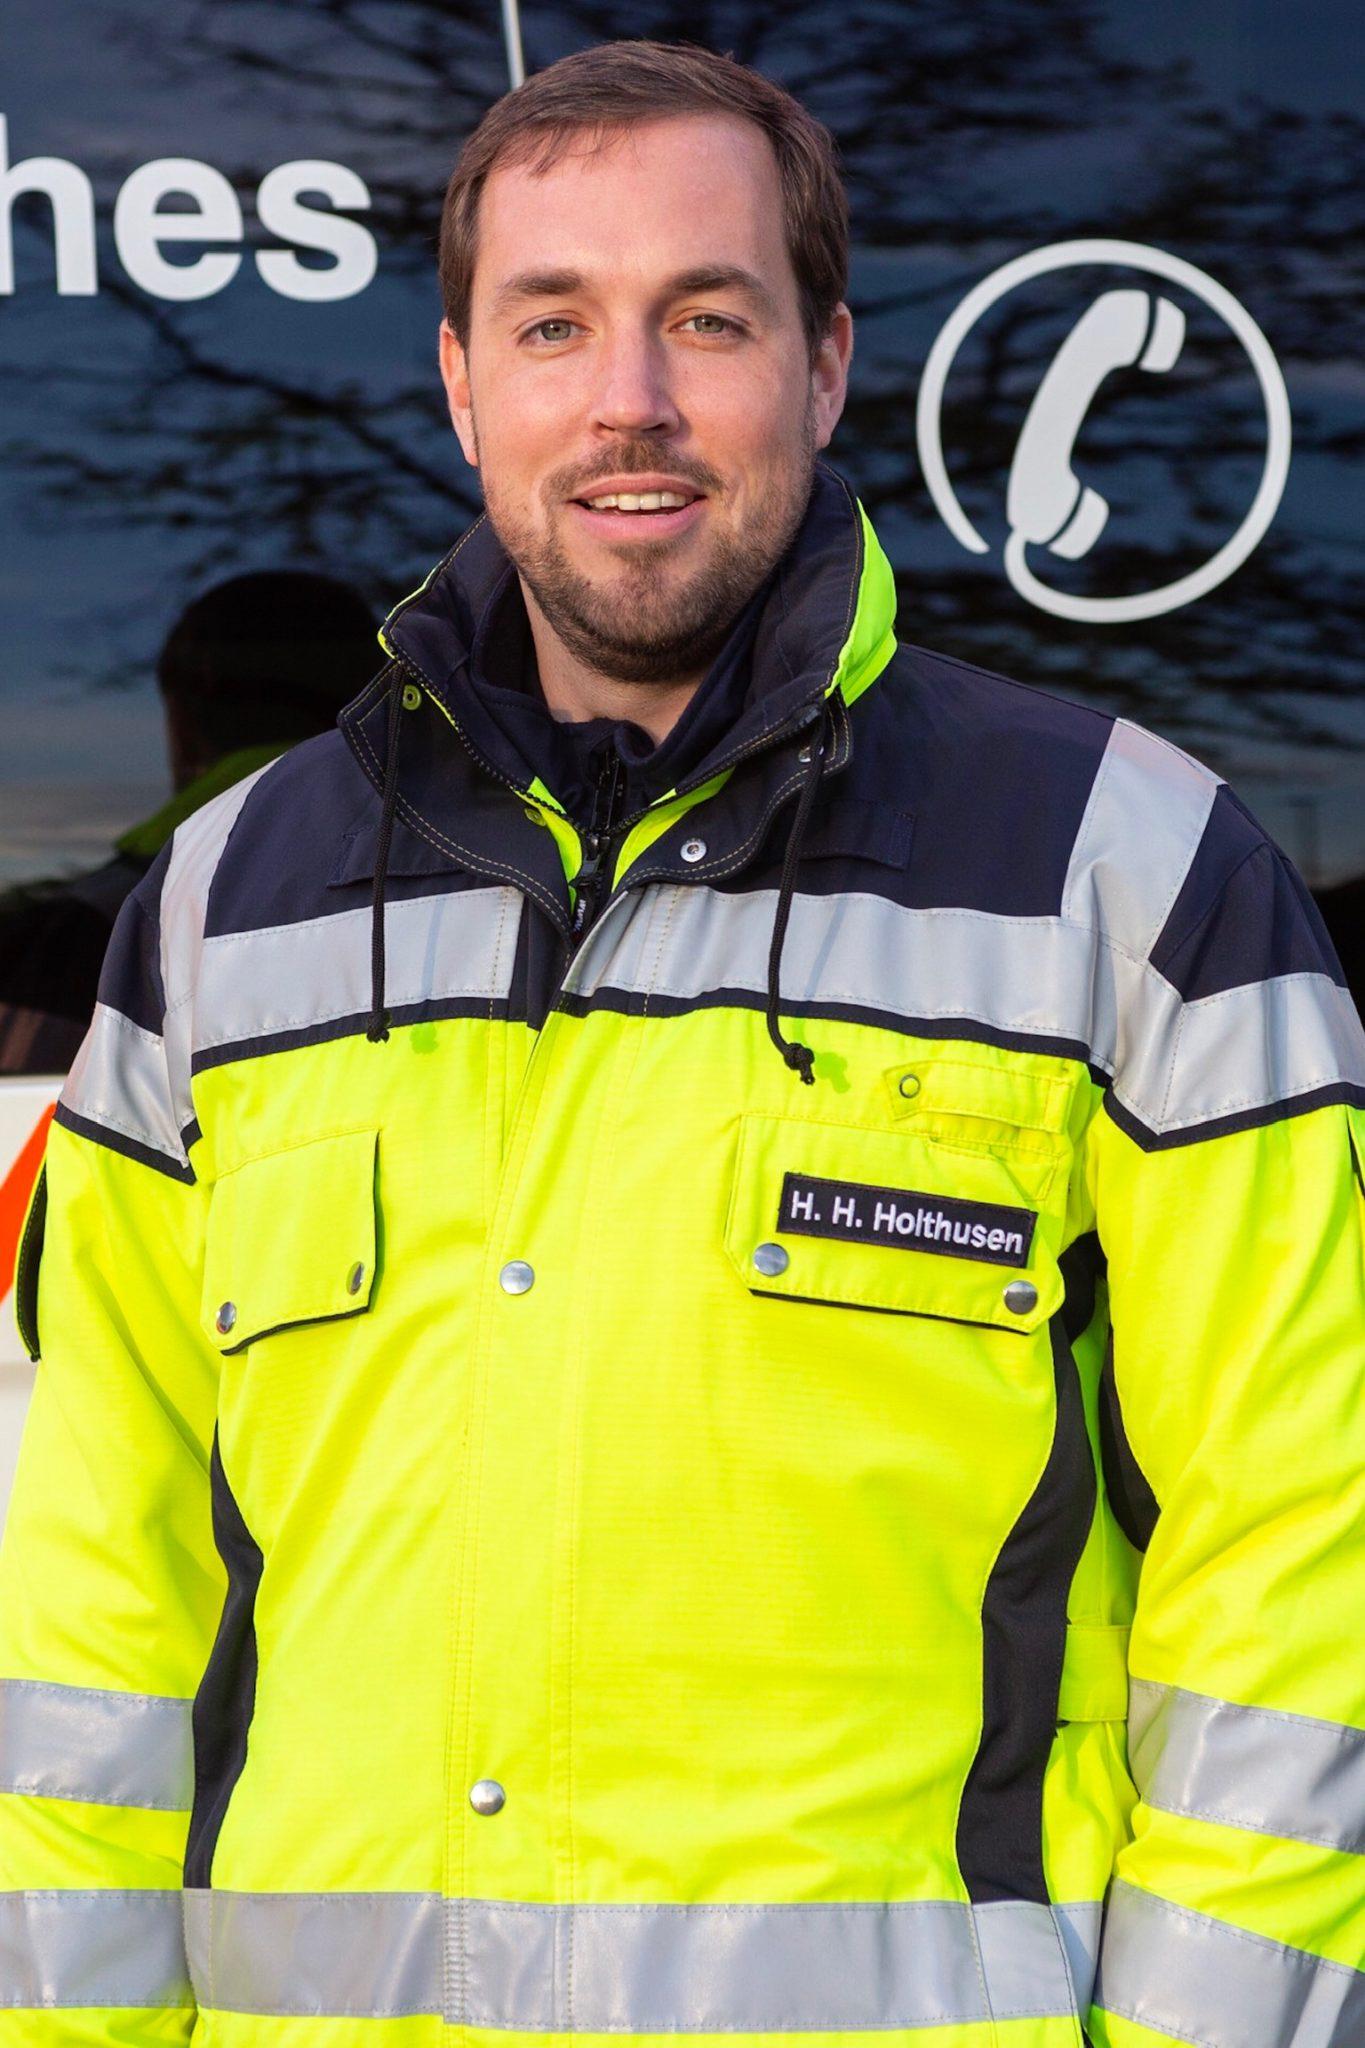 Hans Hendrik Holthusen